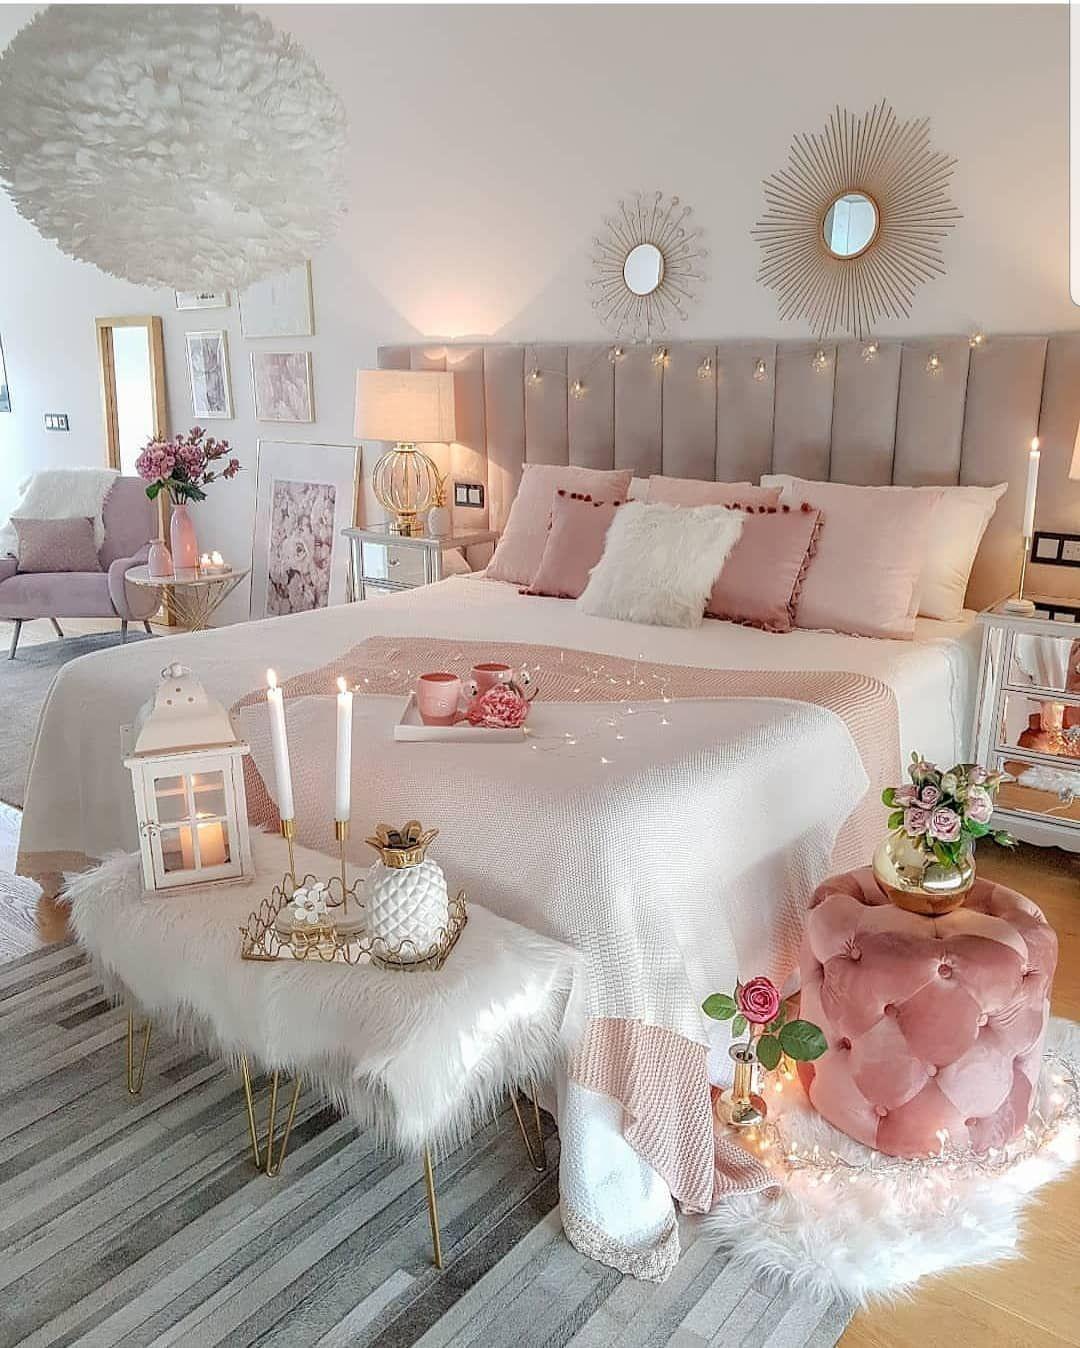 Creme tamishome bedroomdecor bedroom inspire me home decor ...